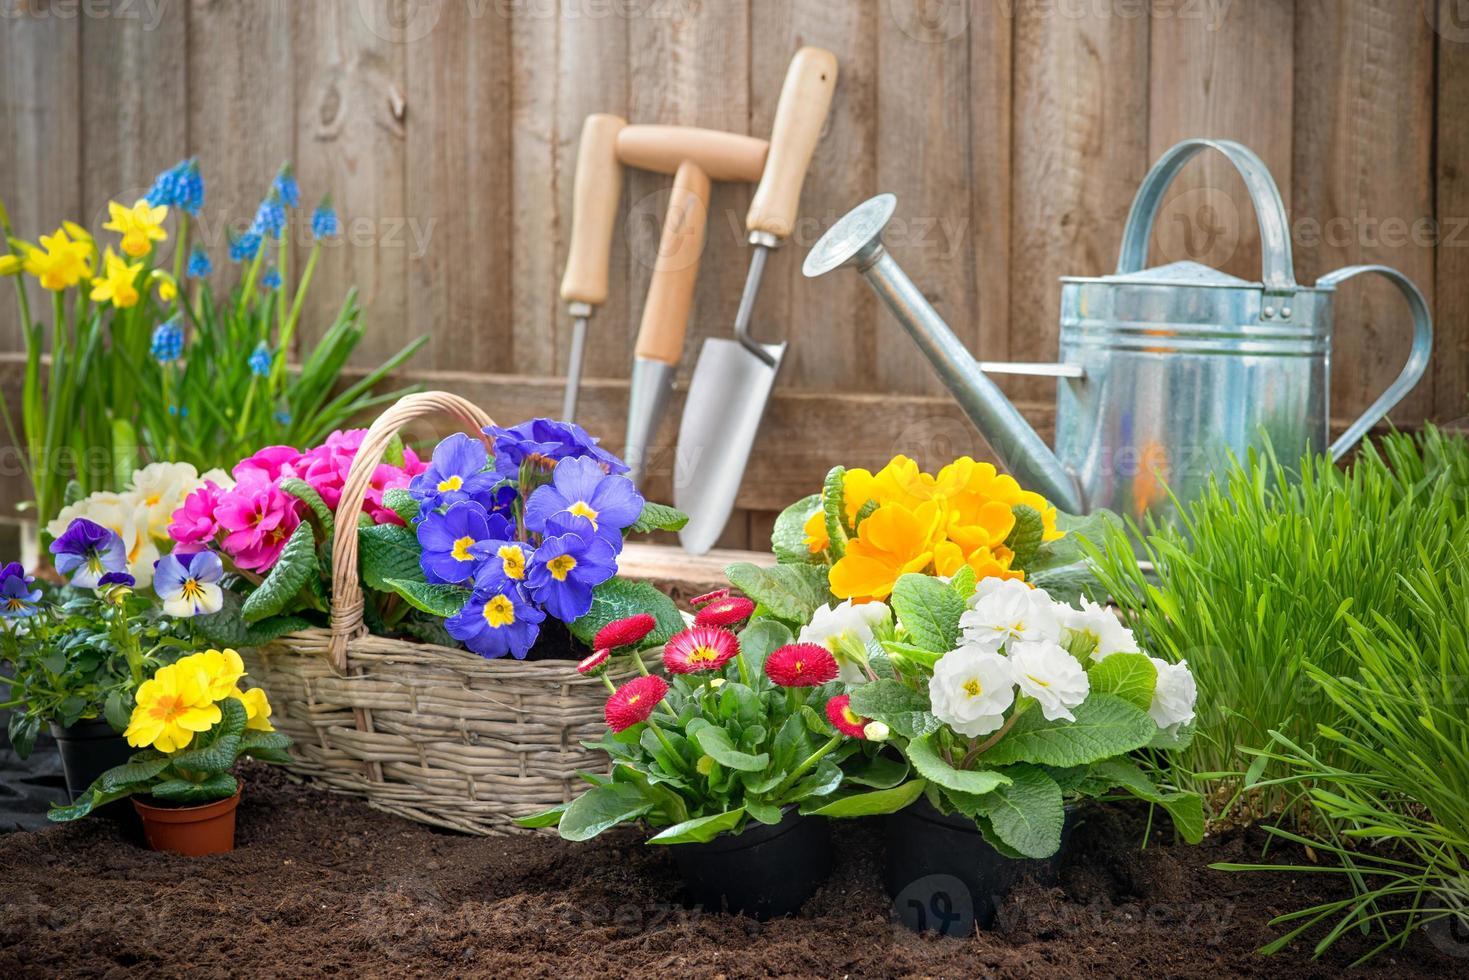 Gardener planting flowers photo